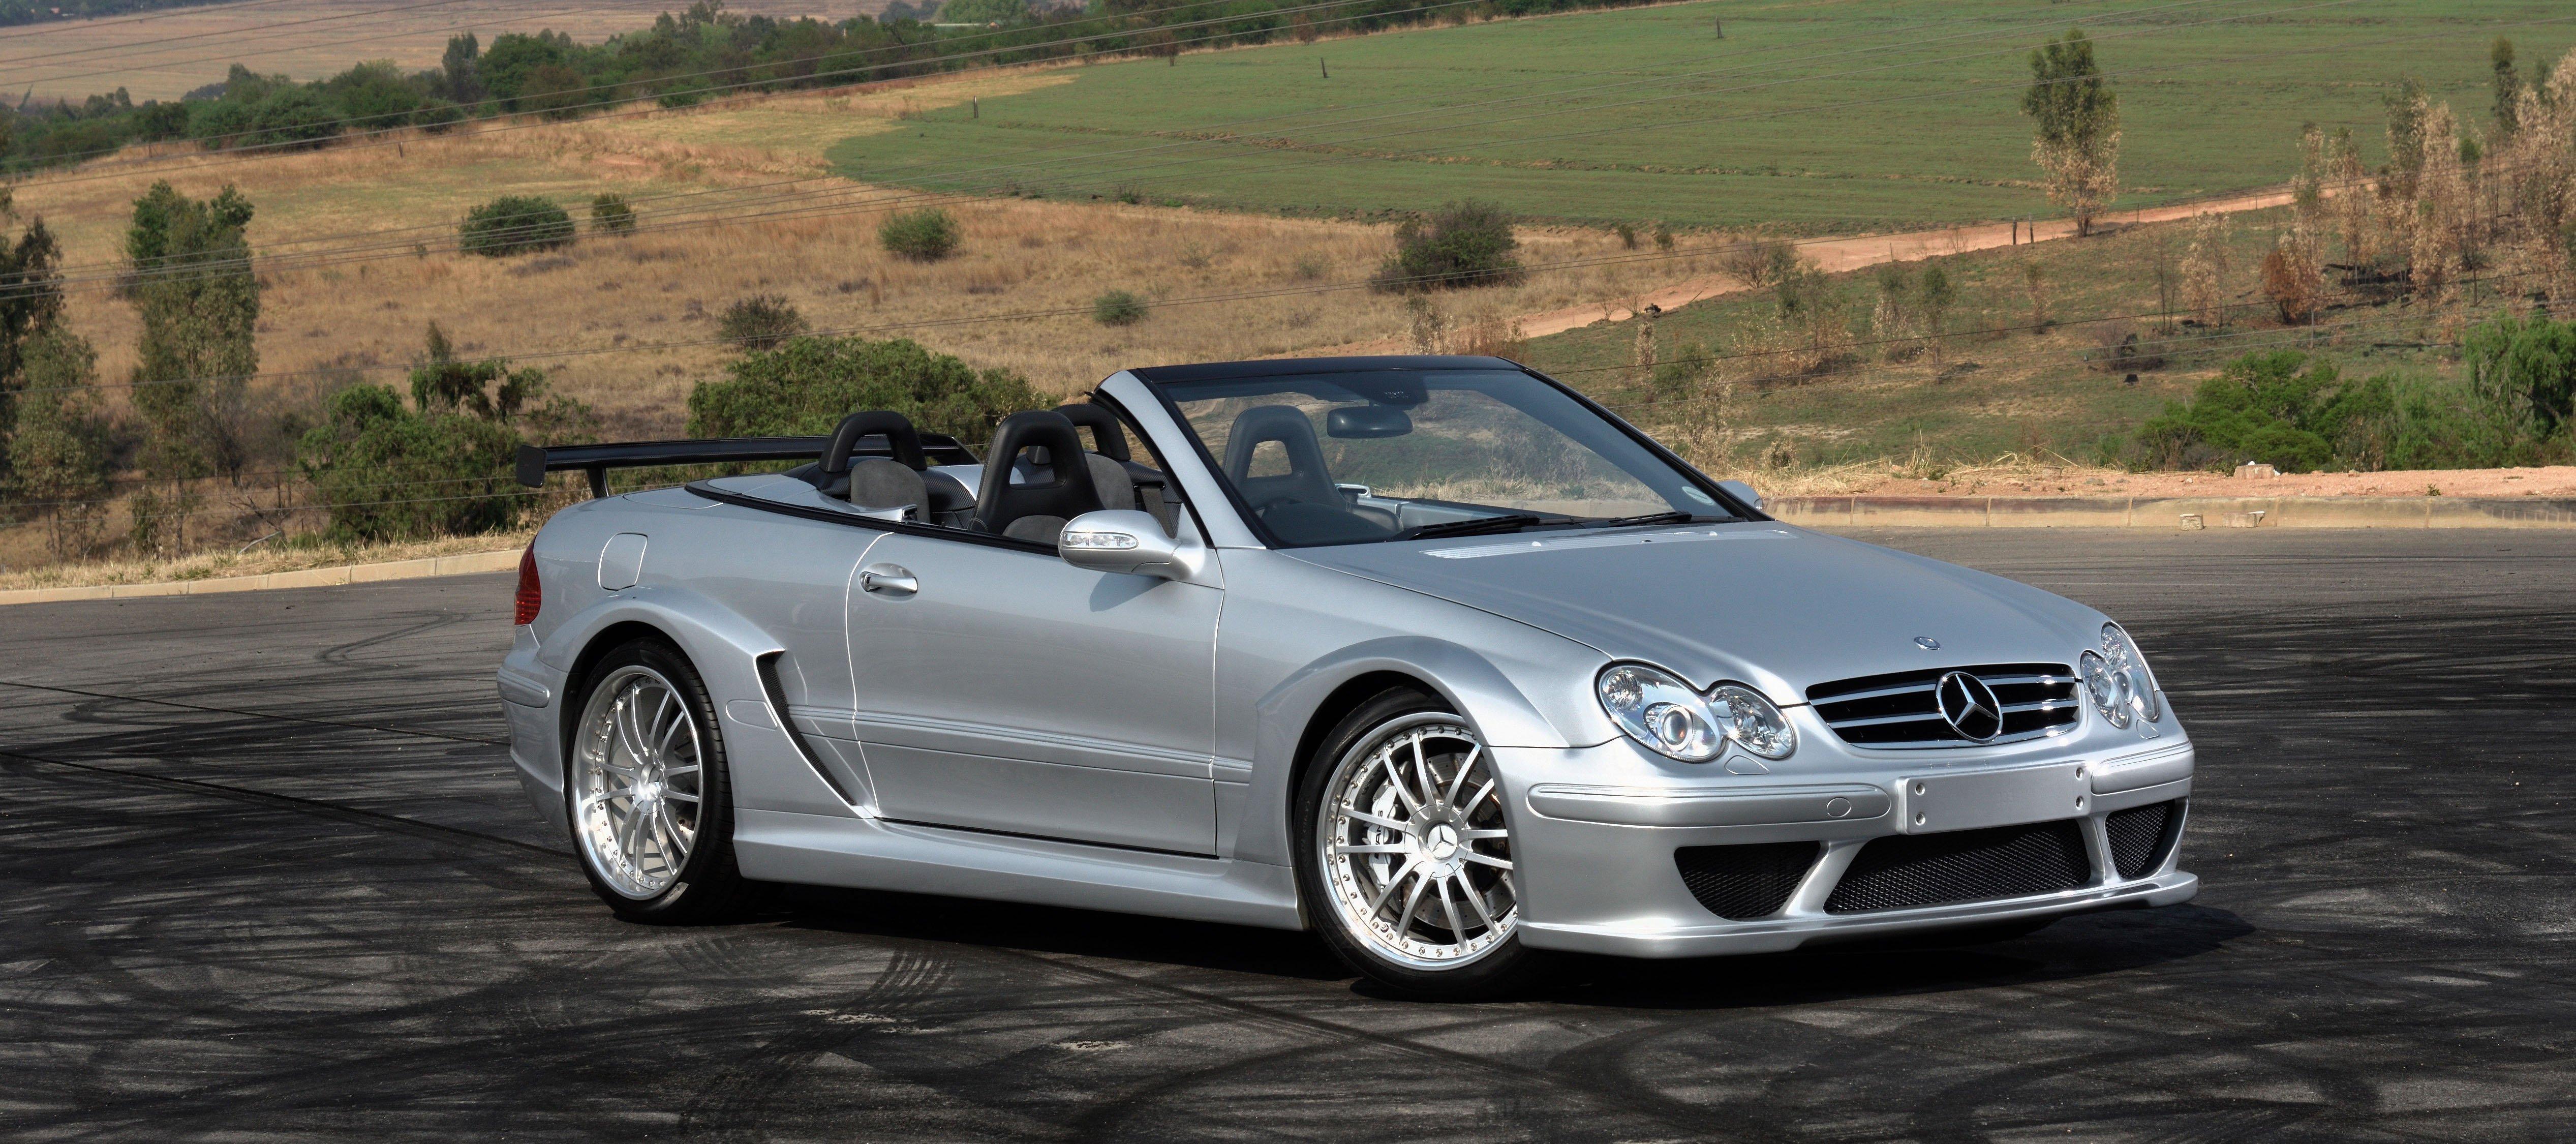 Mercedes Benz CLK DTM Convertible